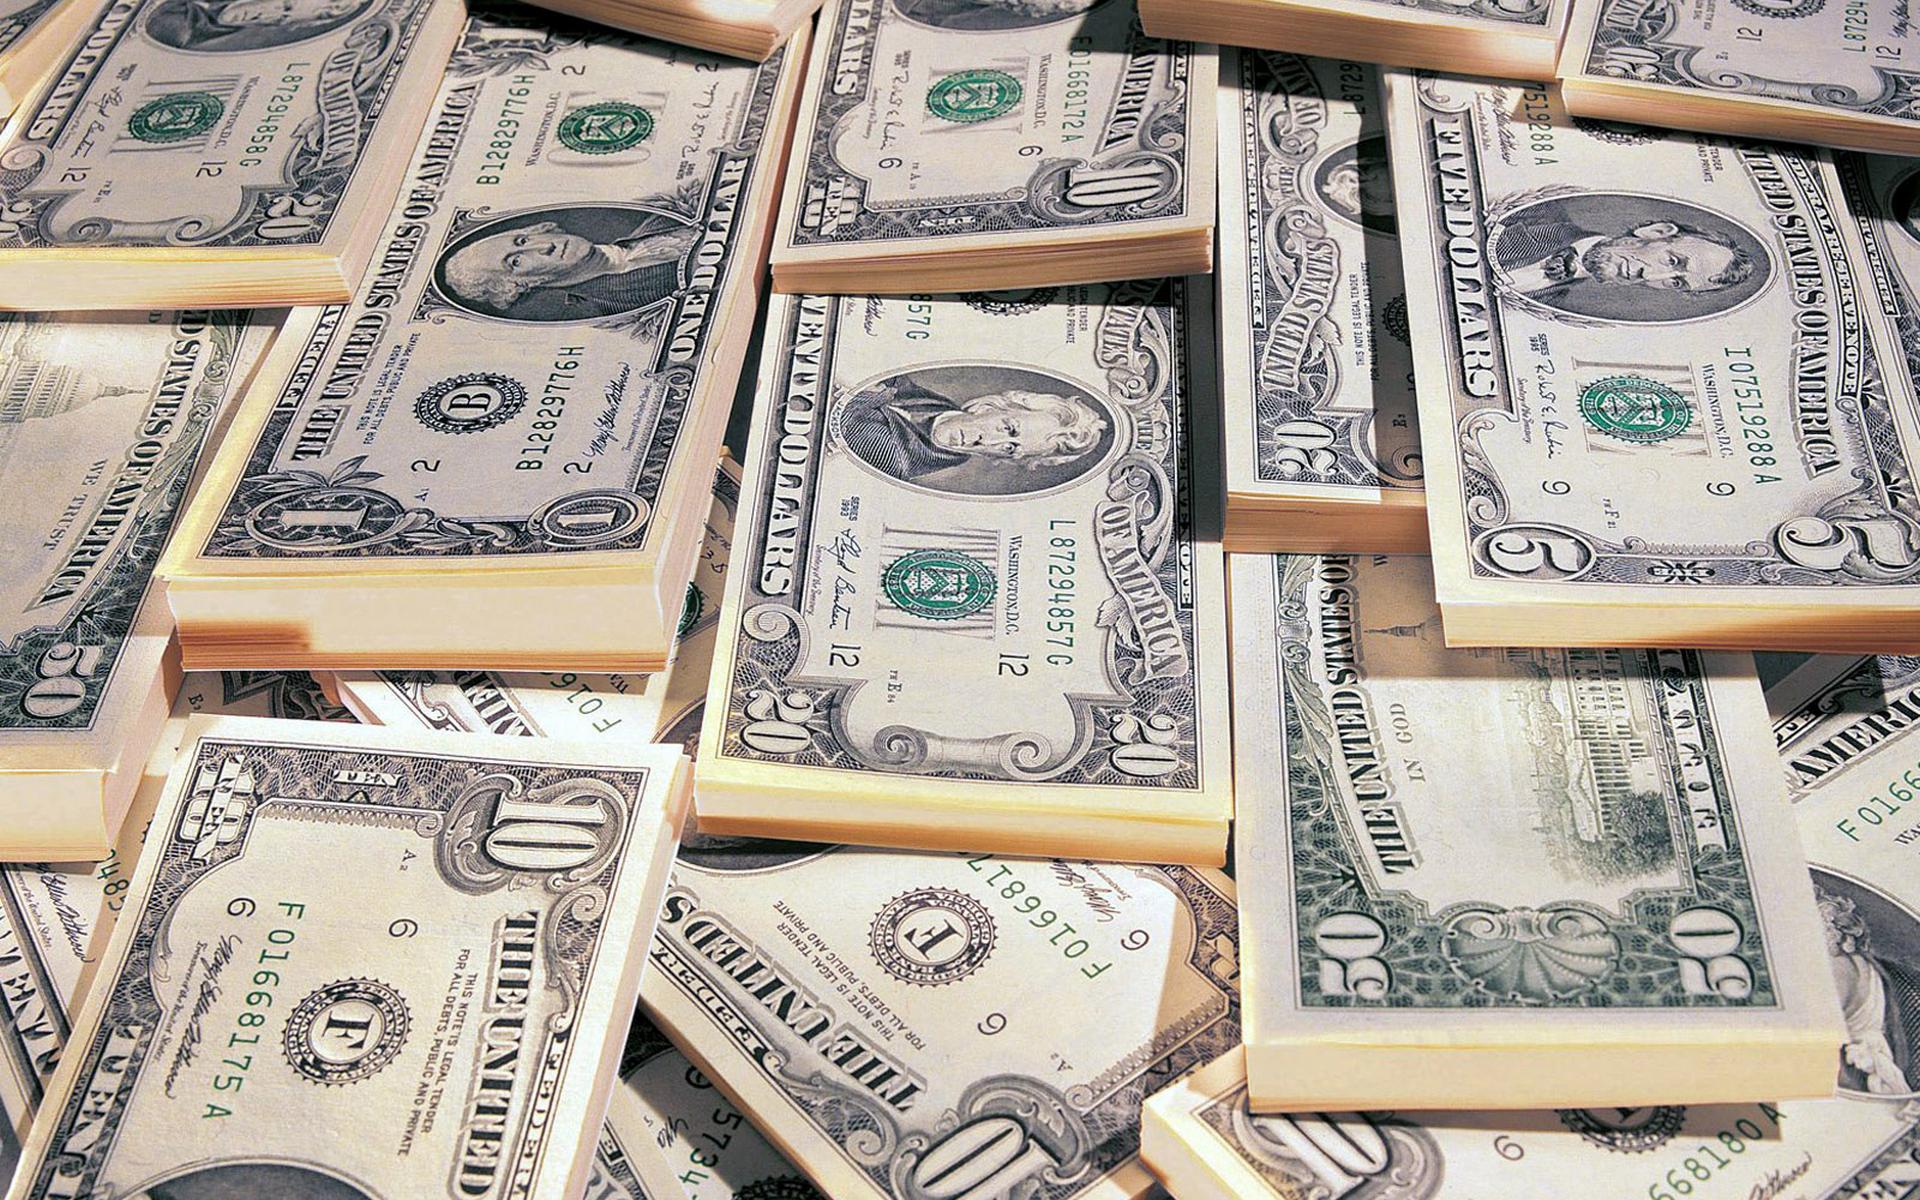 доллары, купюры, банкноты